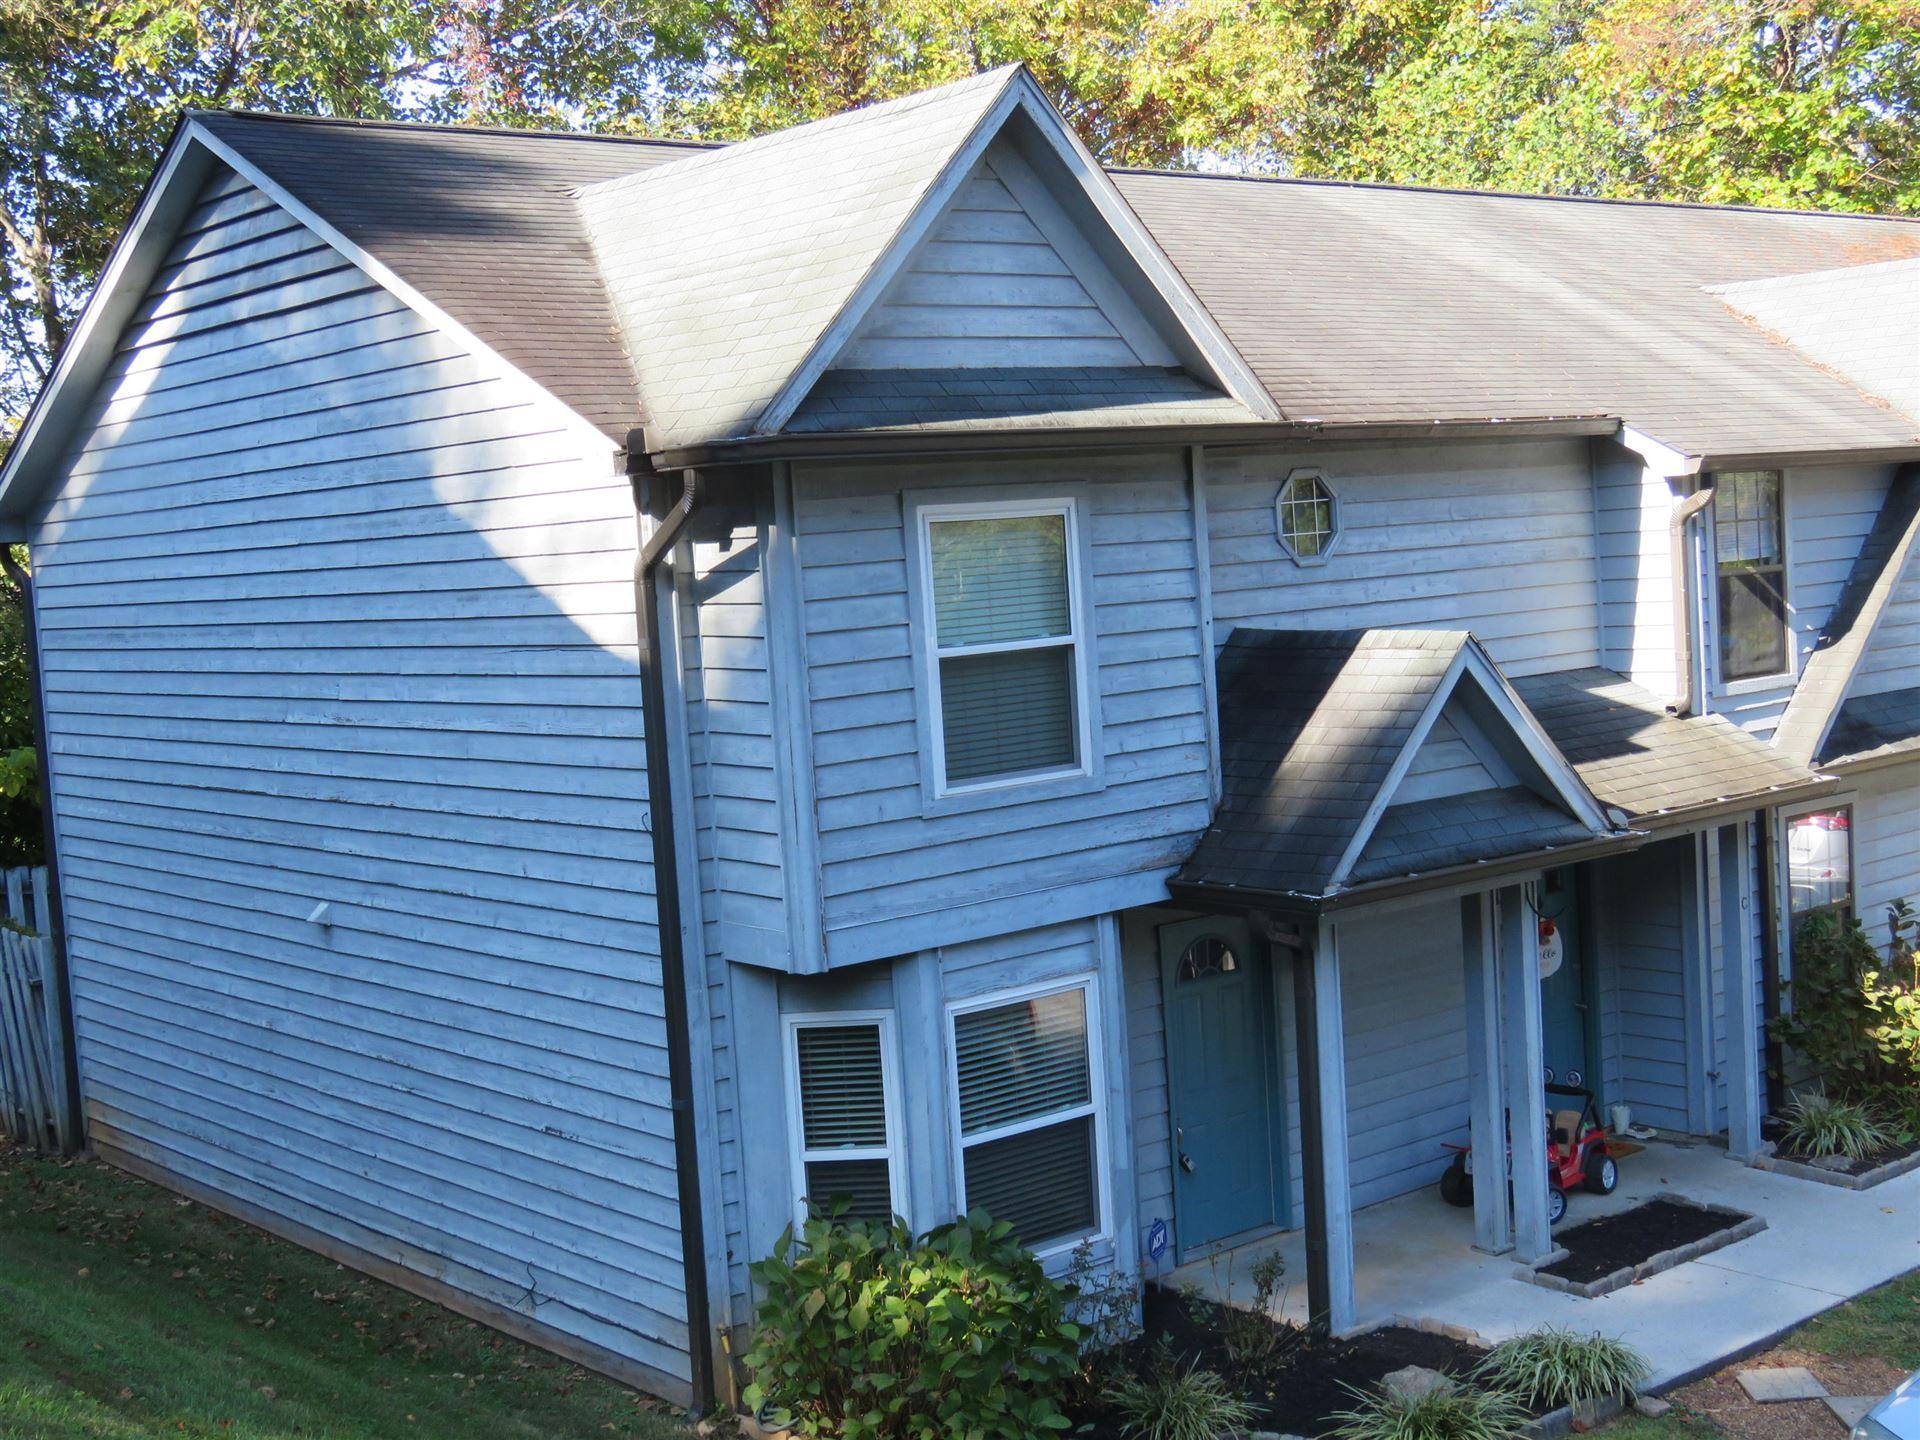 Photo of 625 Idlewood Lane #Apt D, Knoxville, TN 37923 (MLS # 1133356)